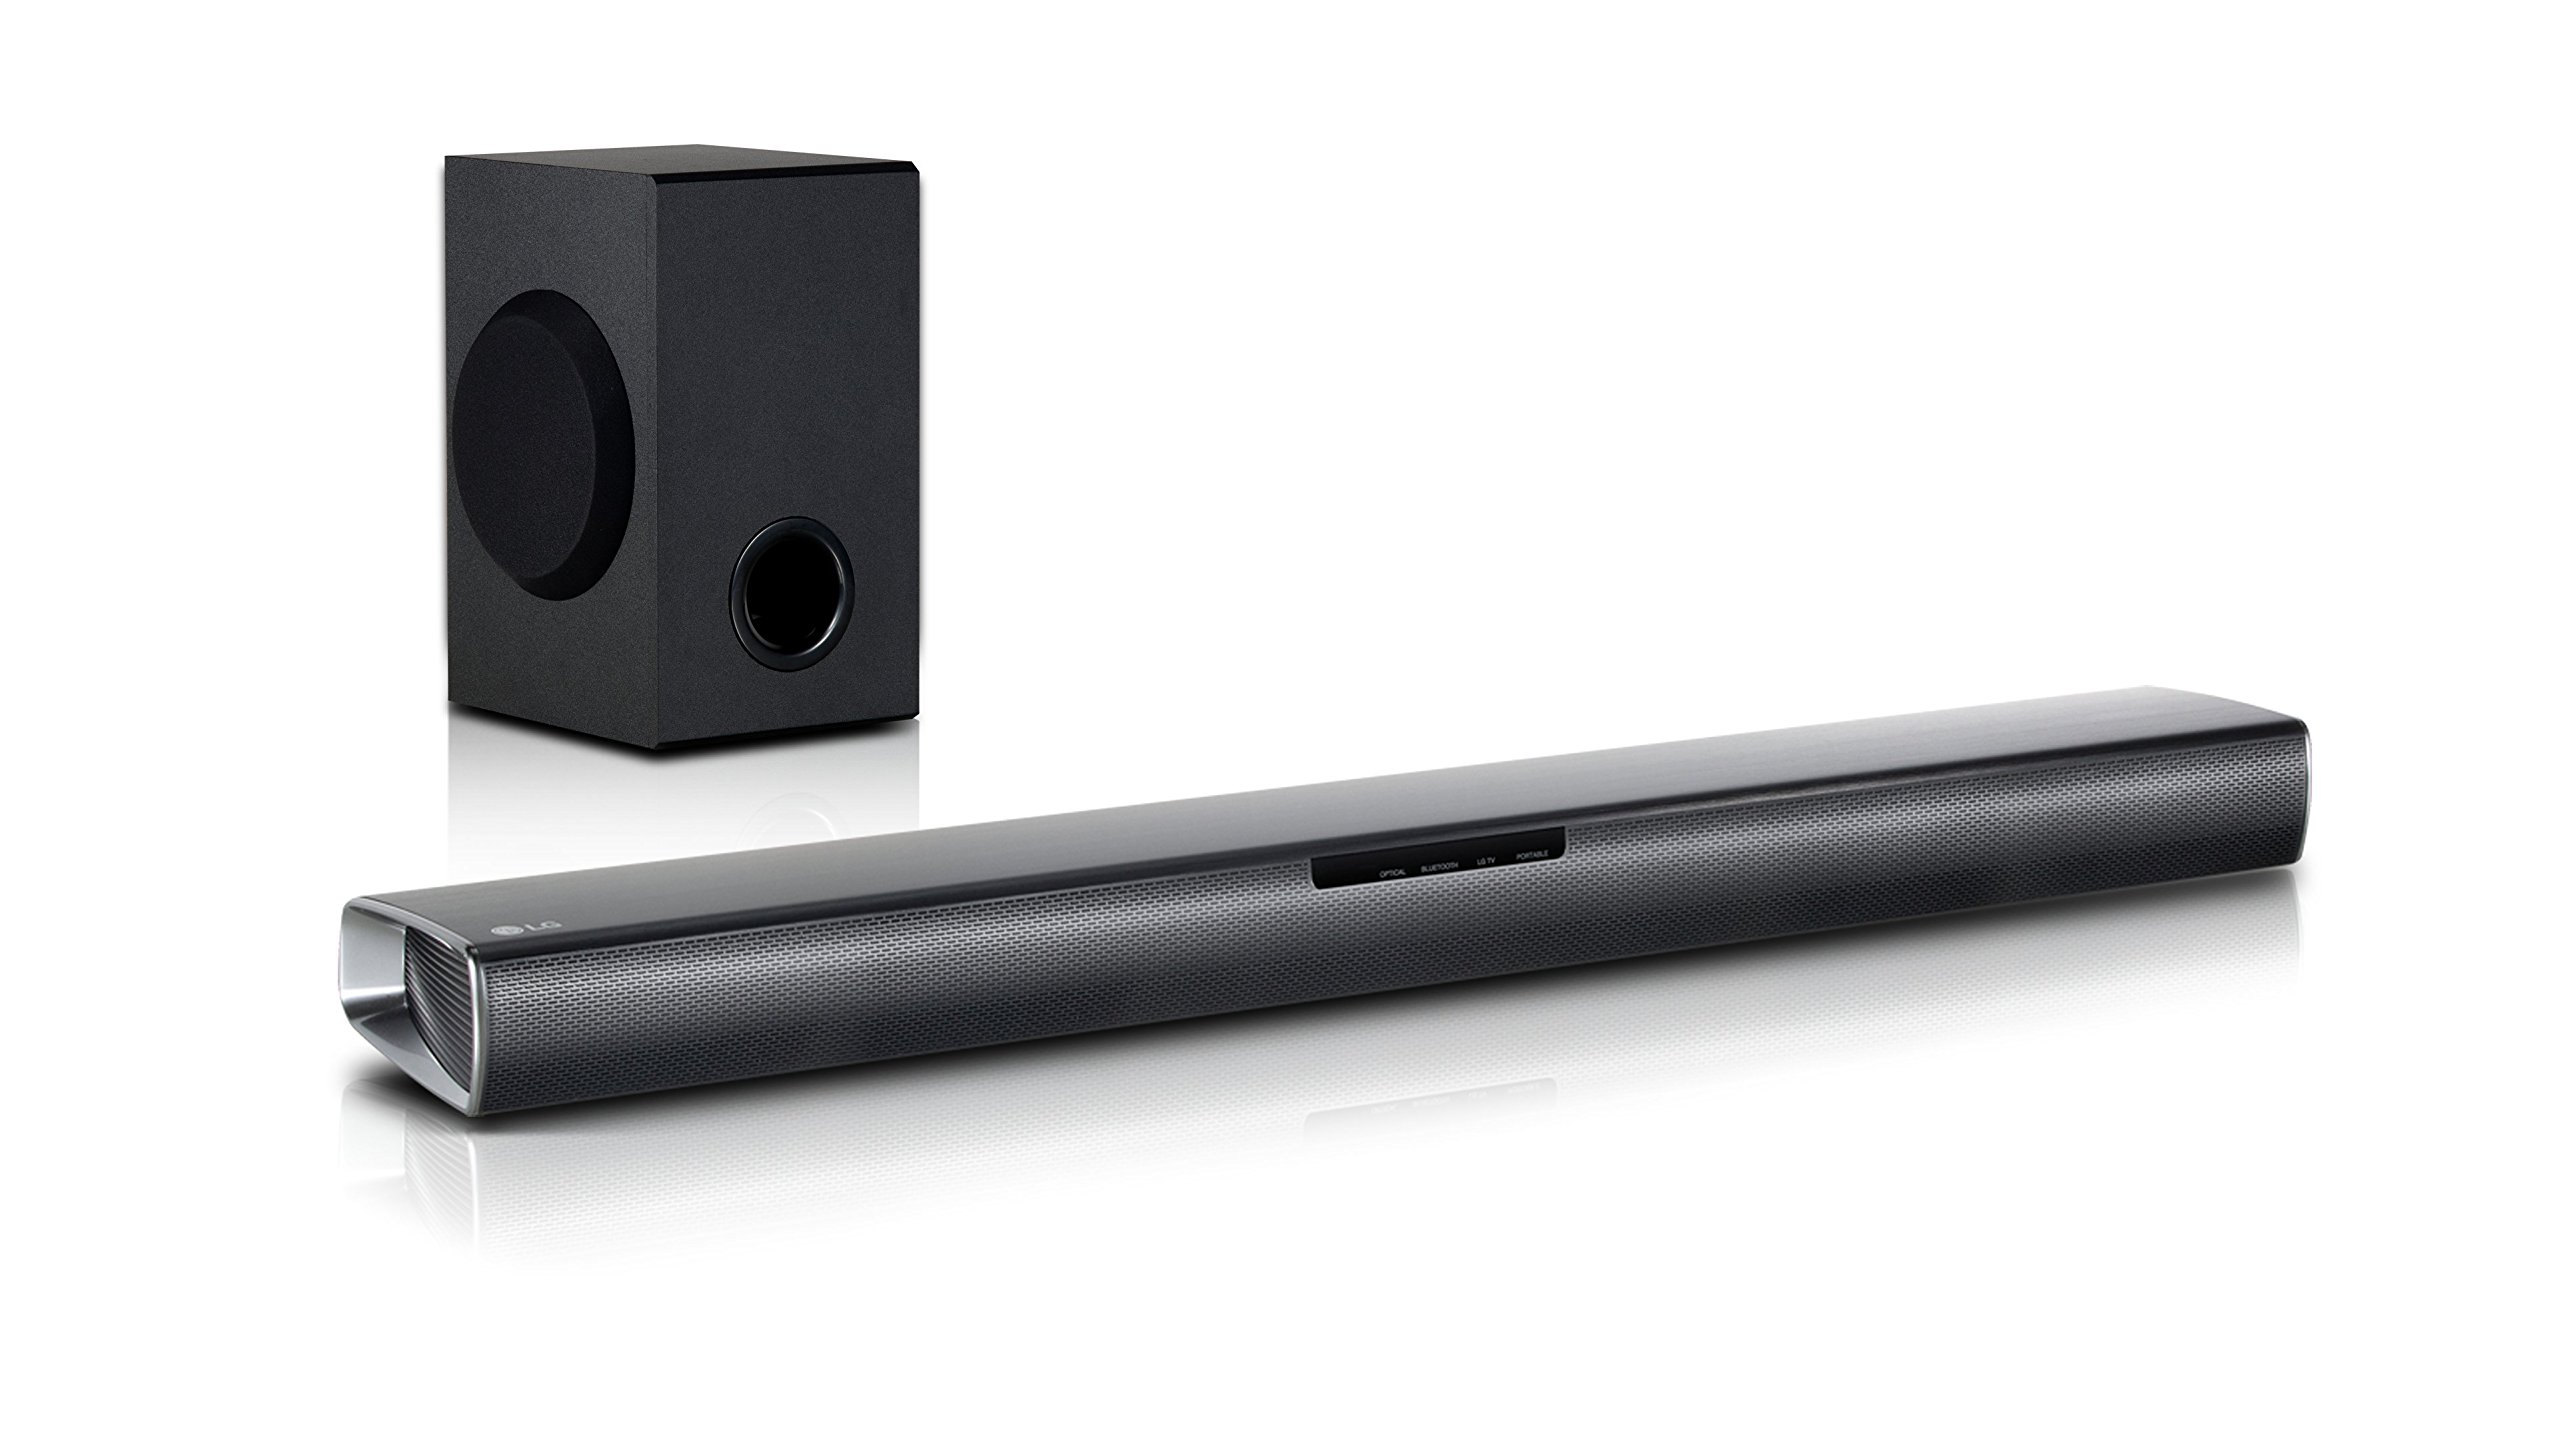 LG SJ2 - Barra de sonido inalá (2.1 channels, 160 W, 60 W